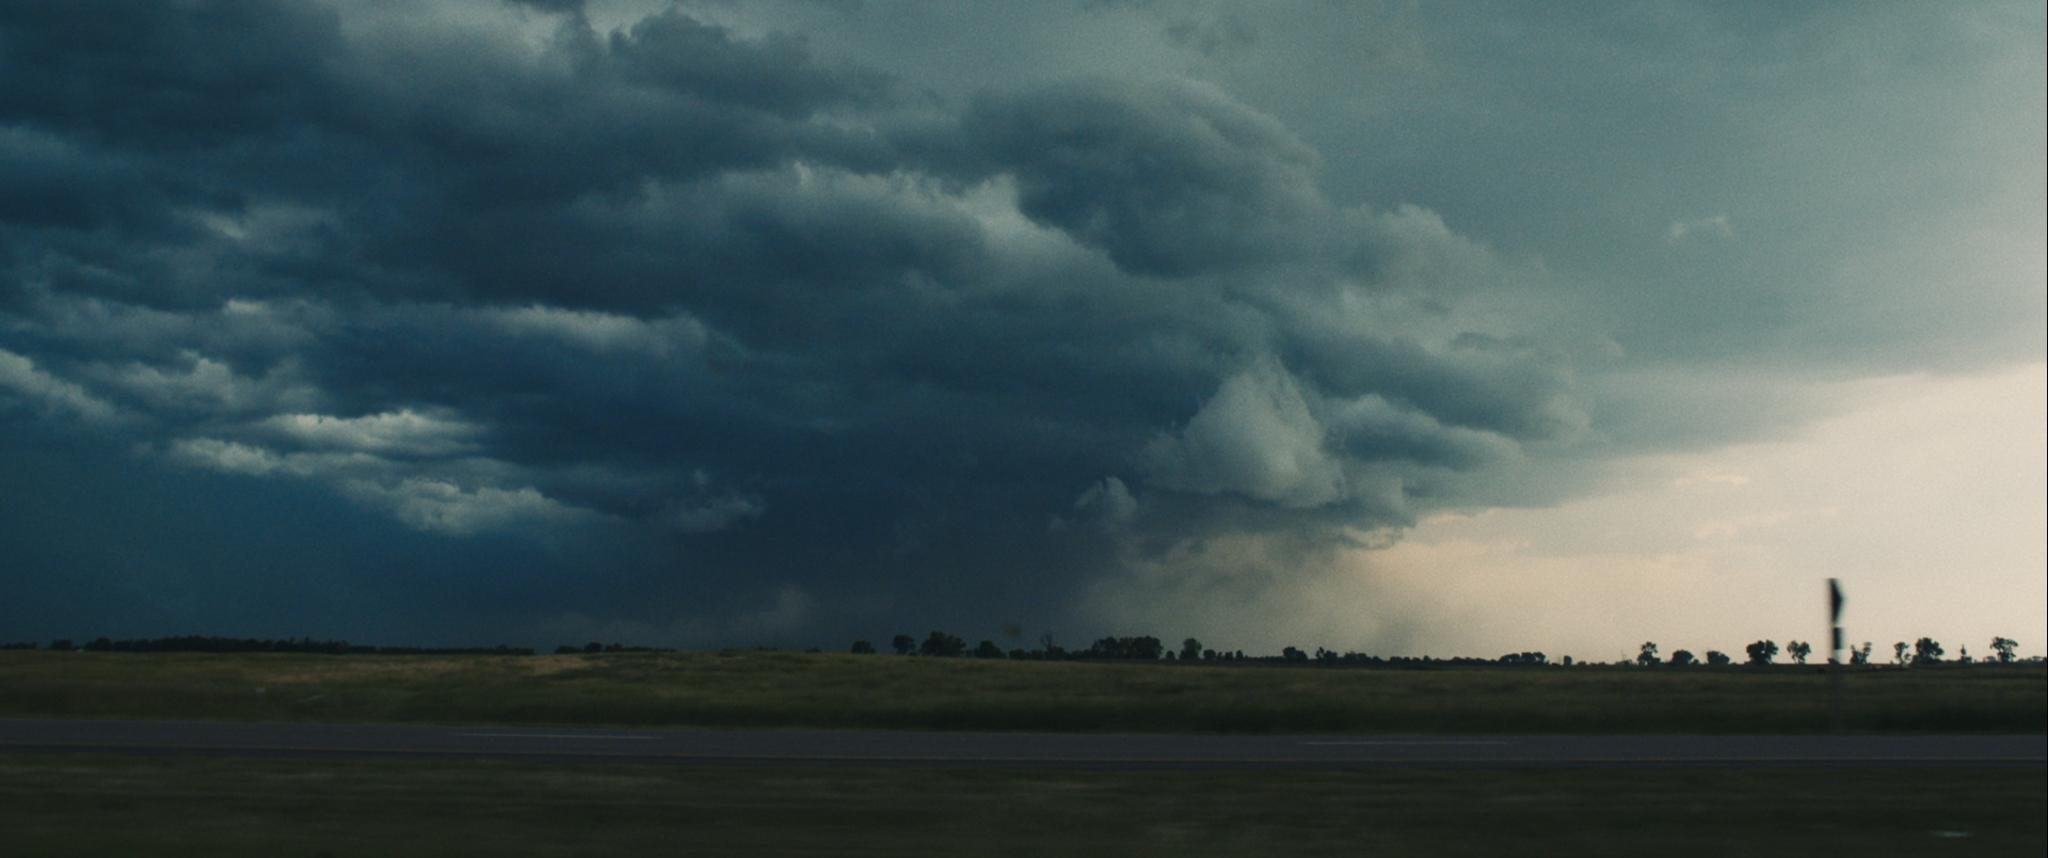 THe Last Storm_1.51.1.jpg